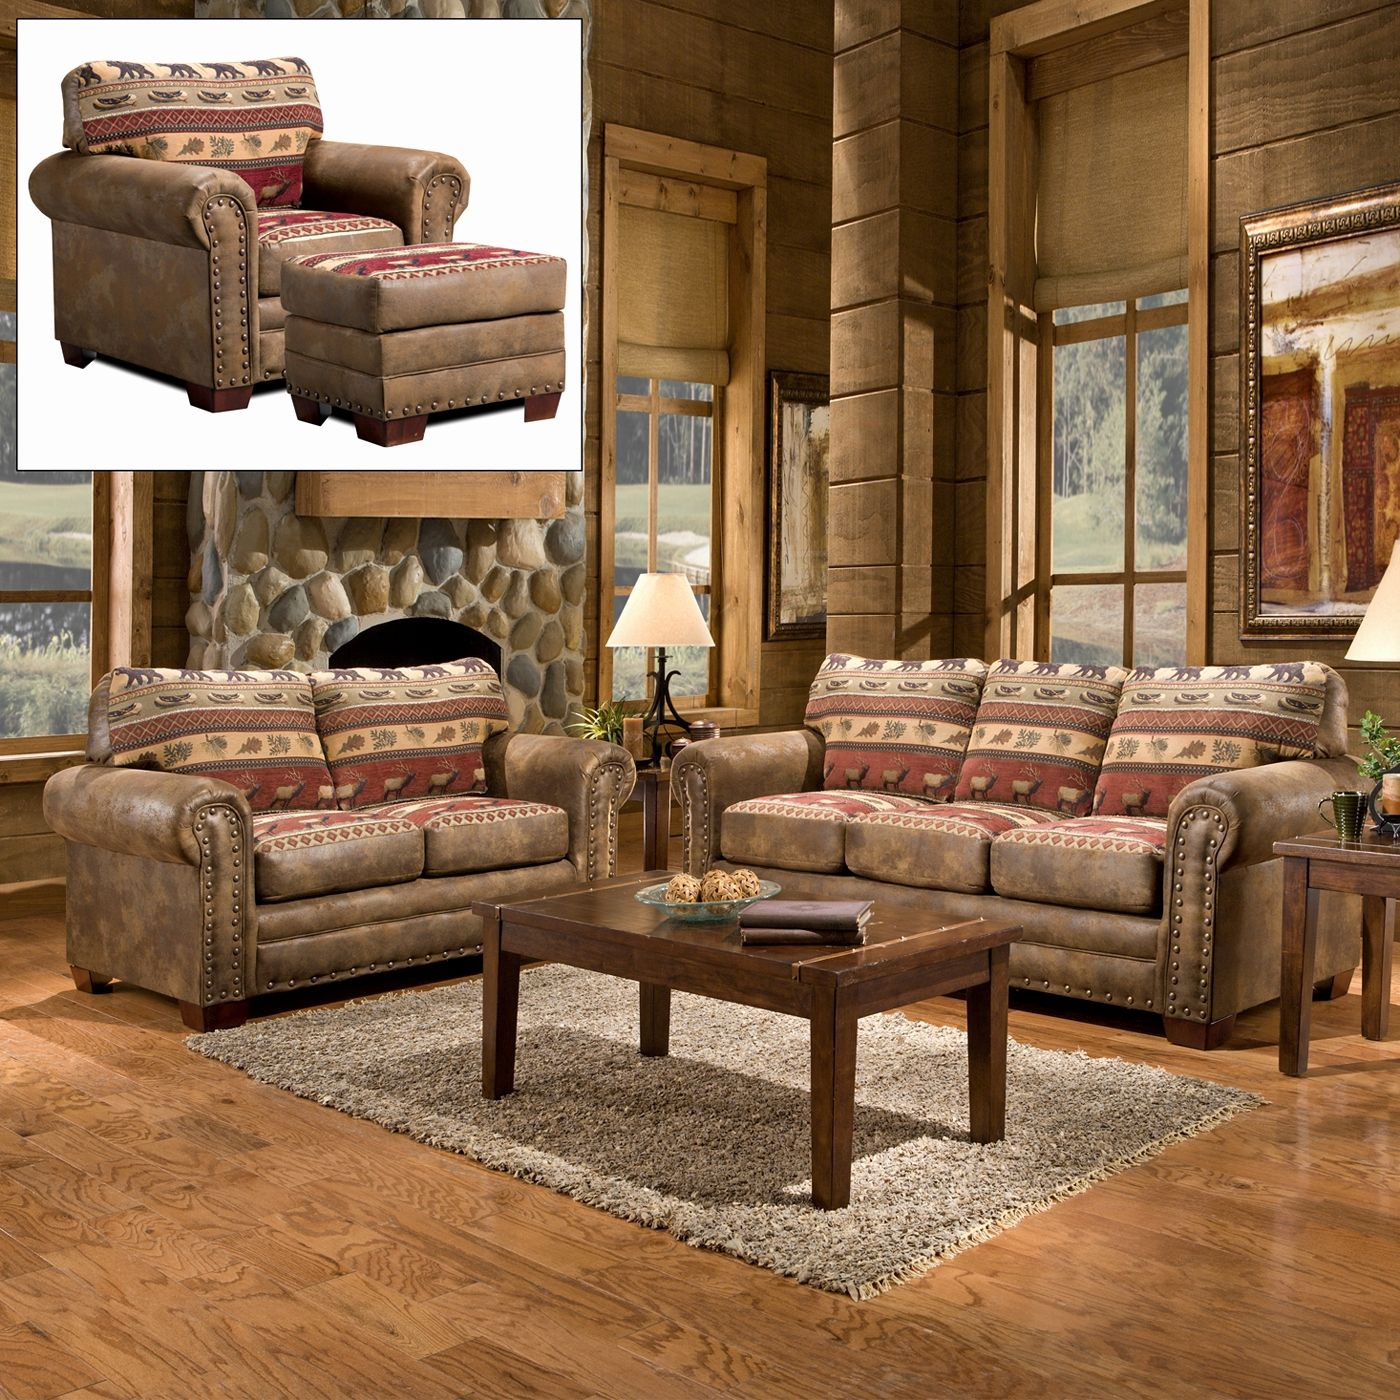 New Furniture Sofa Set Shot Furniture Sofa Set Elegant American